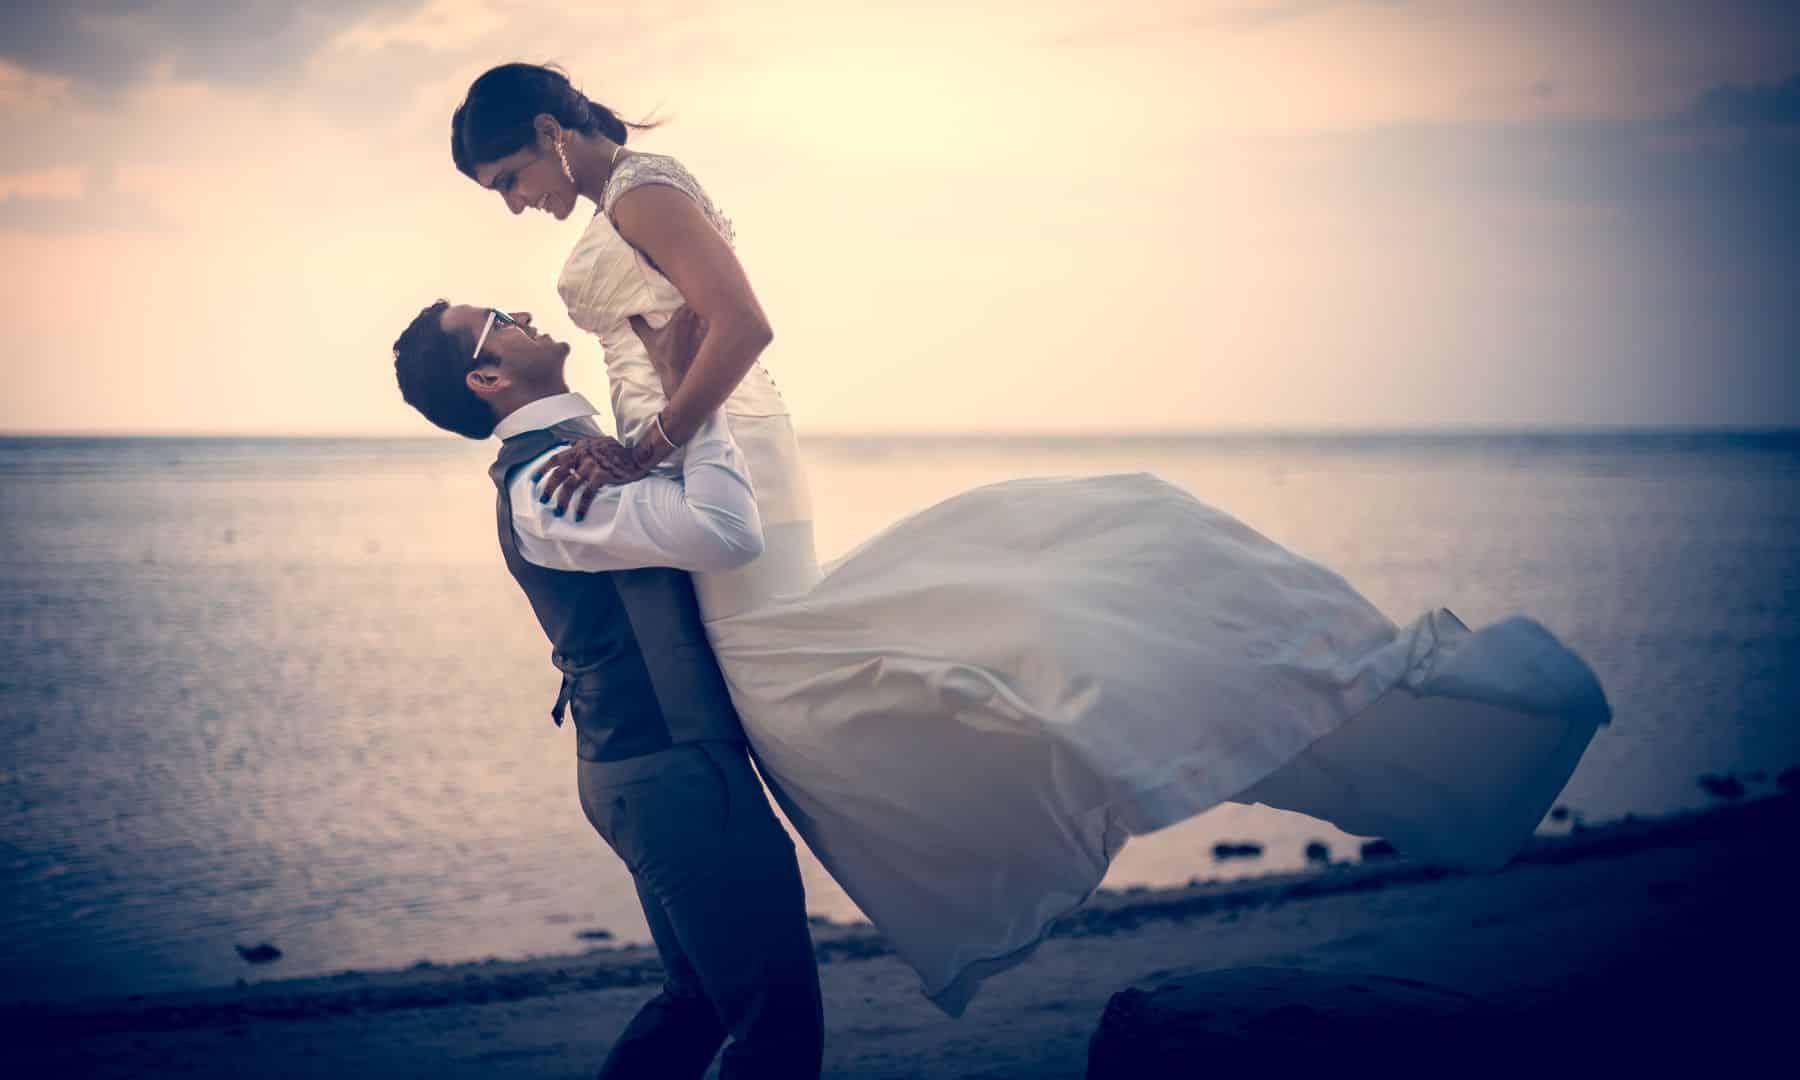 Pre-Wedding Photographer Thailand | Indian Bride Dress | Bali Beach Wedding Photography